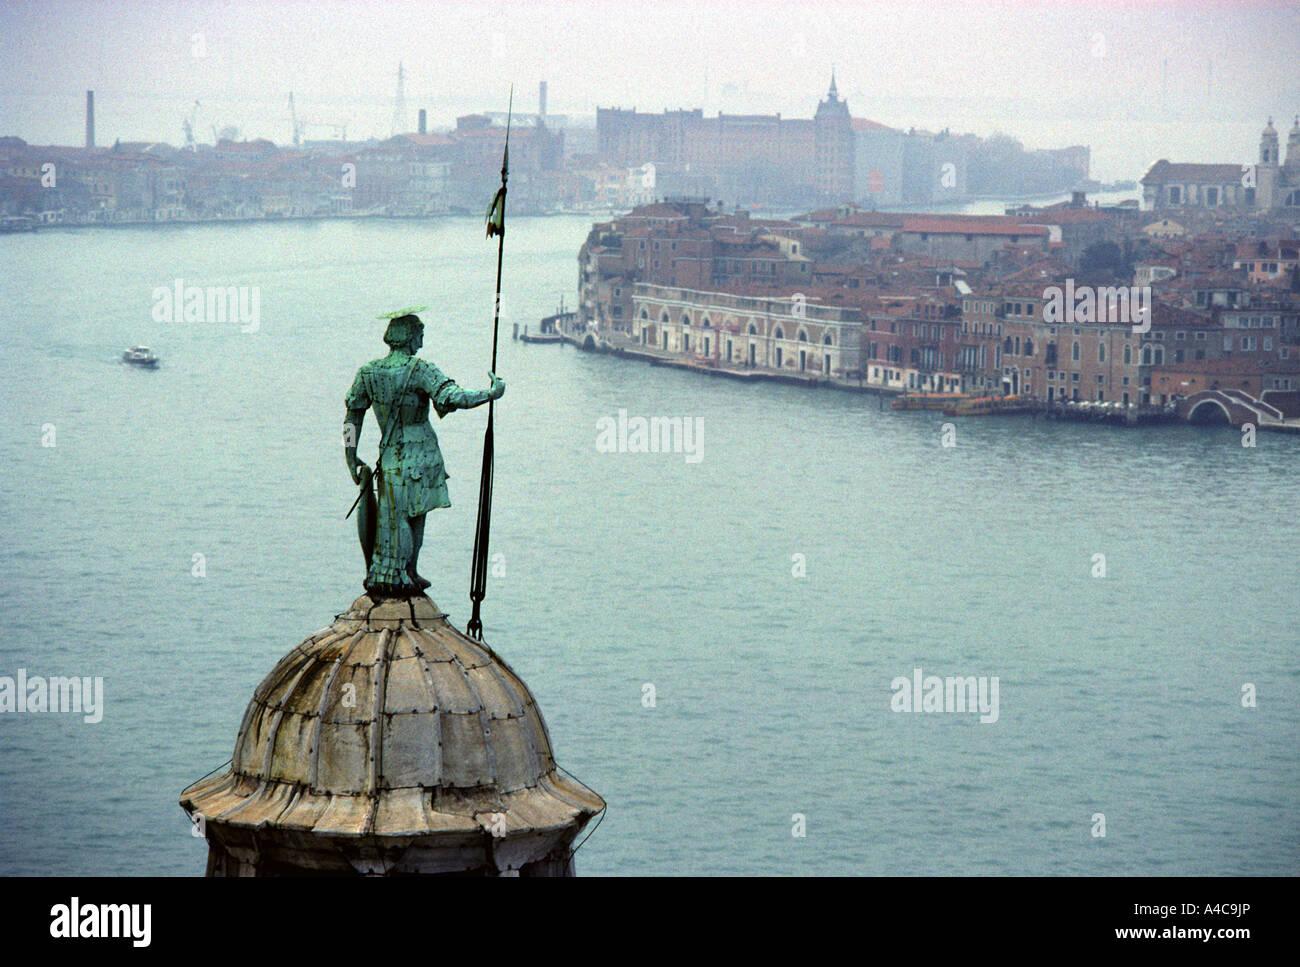 Grand canal, Venise, Italie Banque D'Images